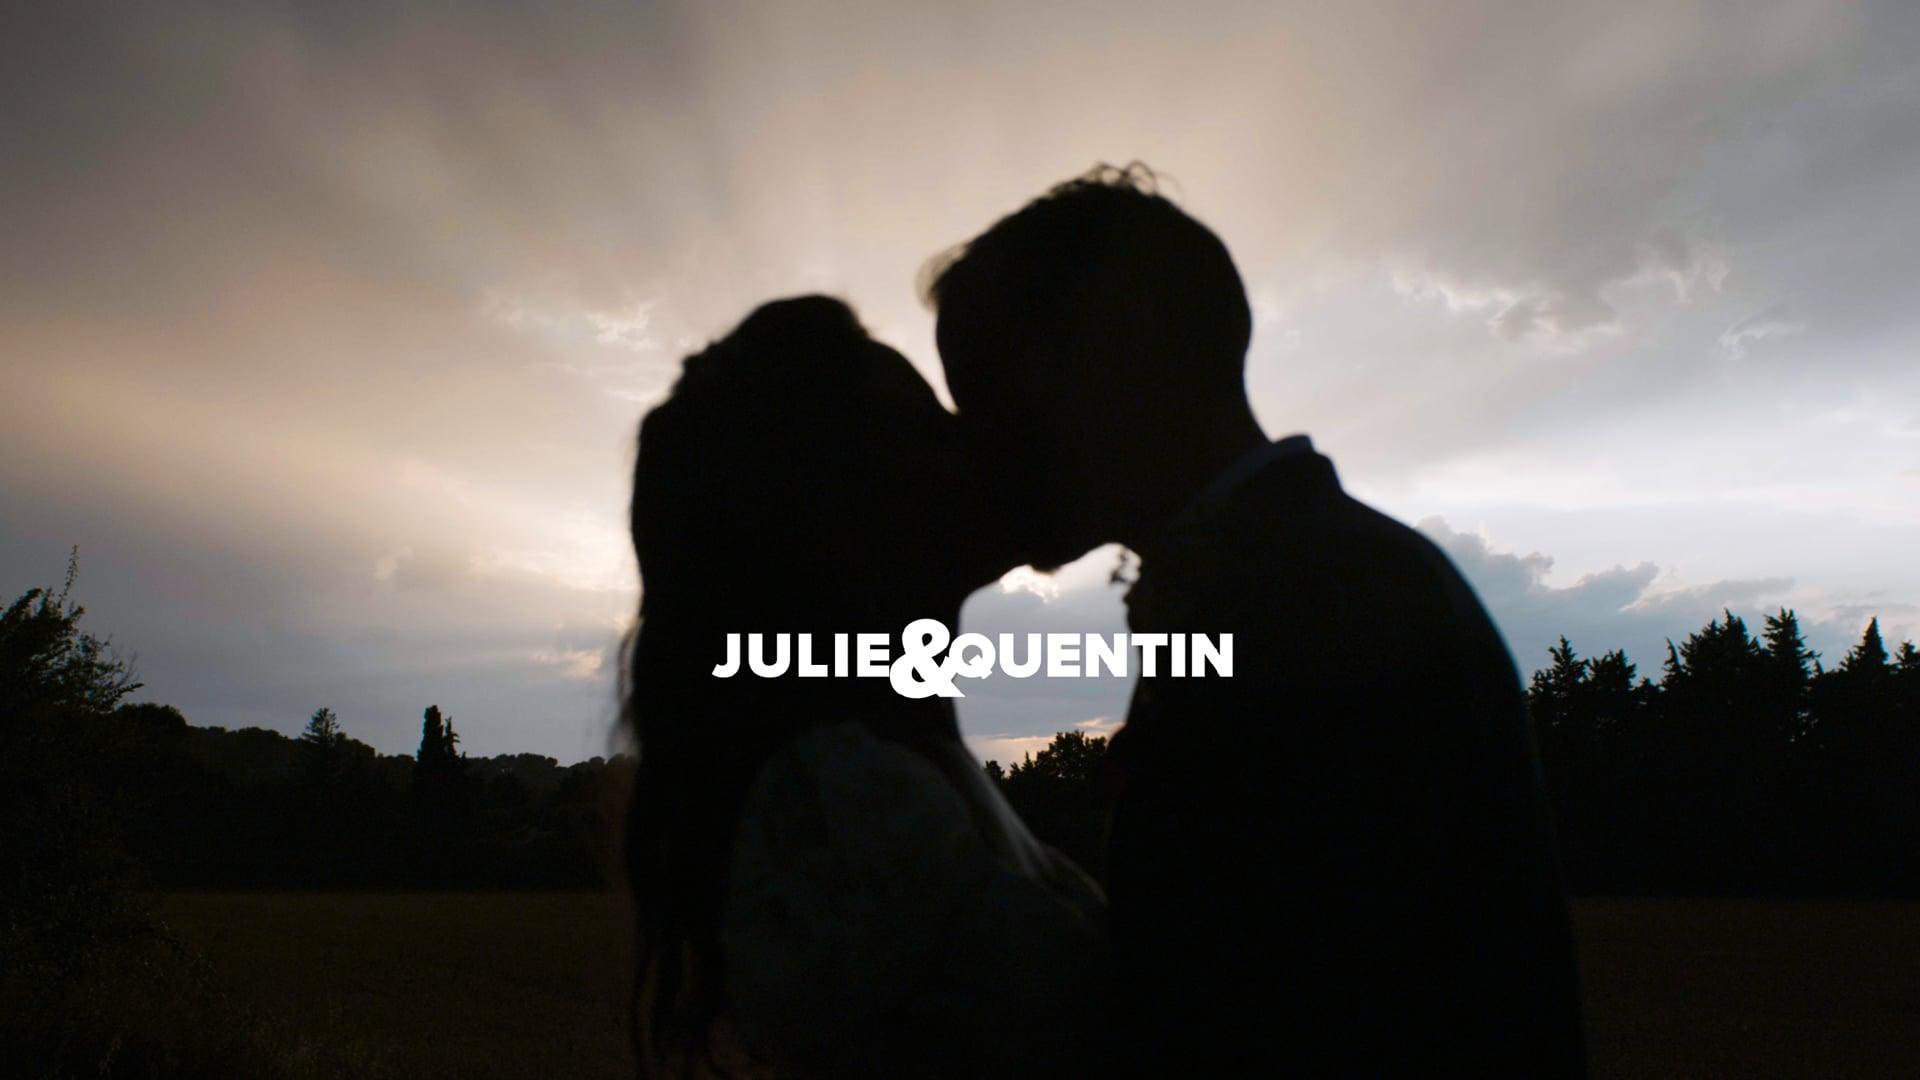 JULIE + QUENTIN